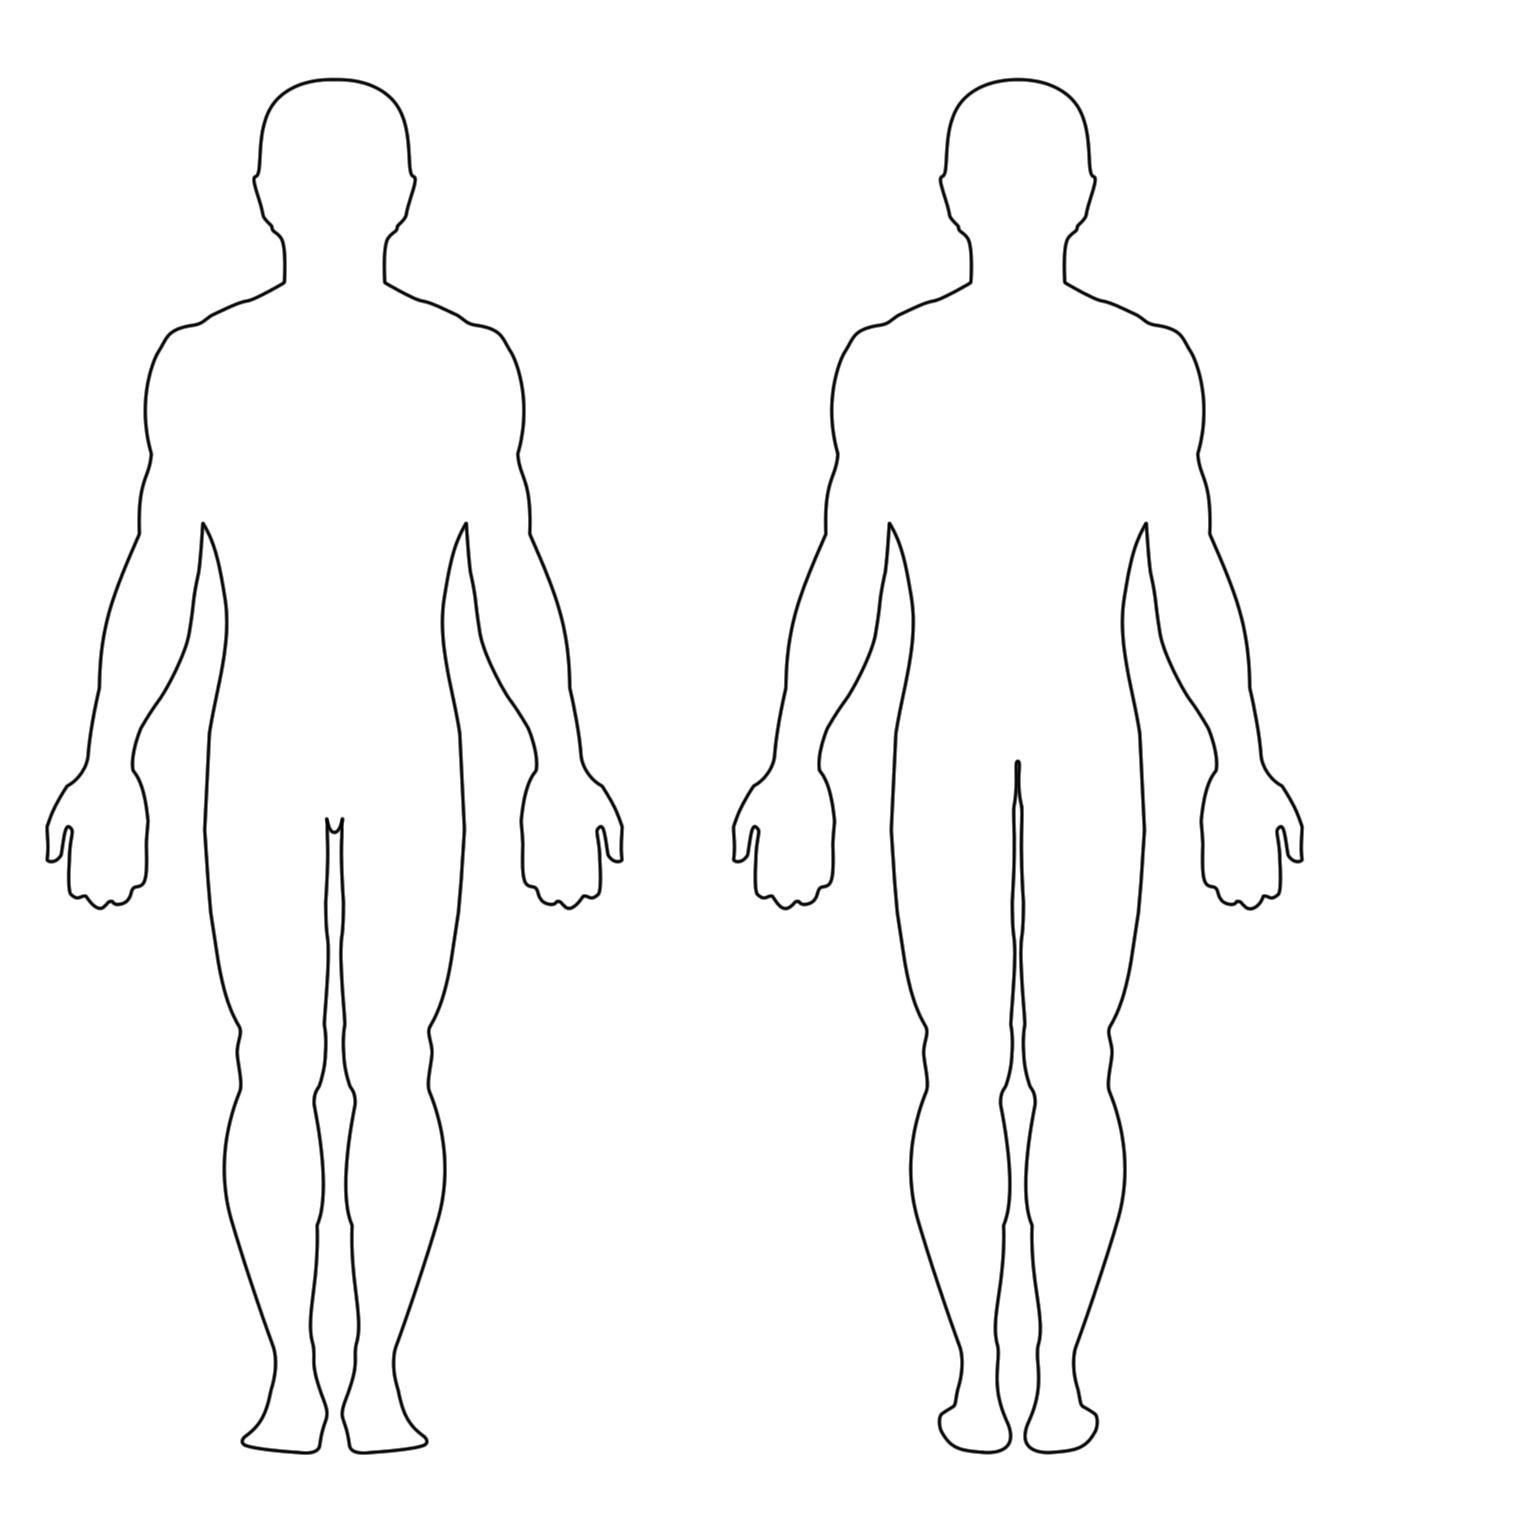 Human Body Diagram Blank - Human AnatomyHuman Anatomy